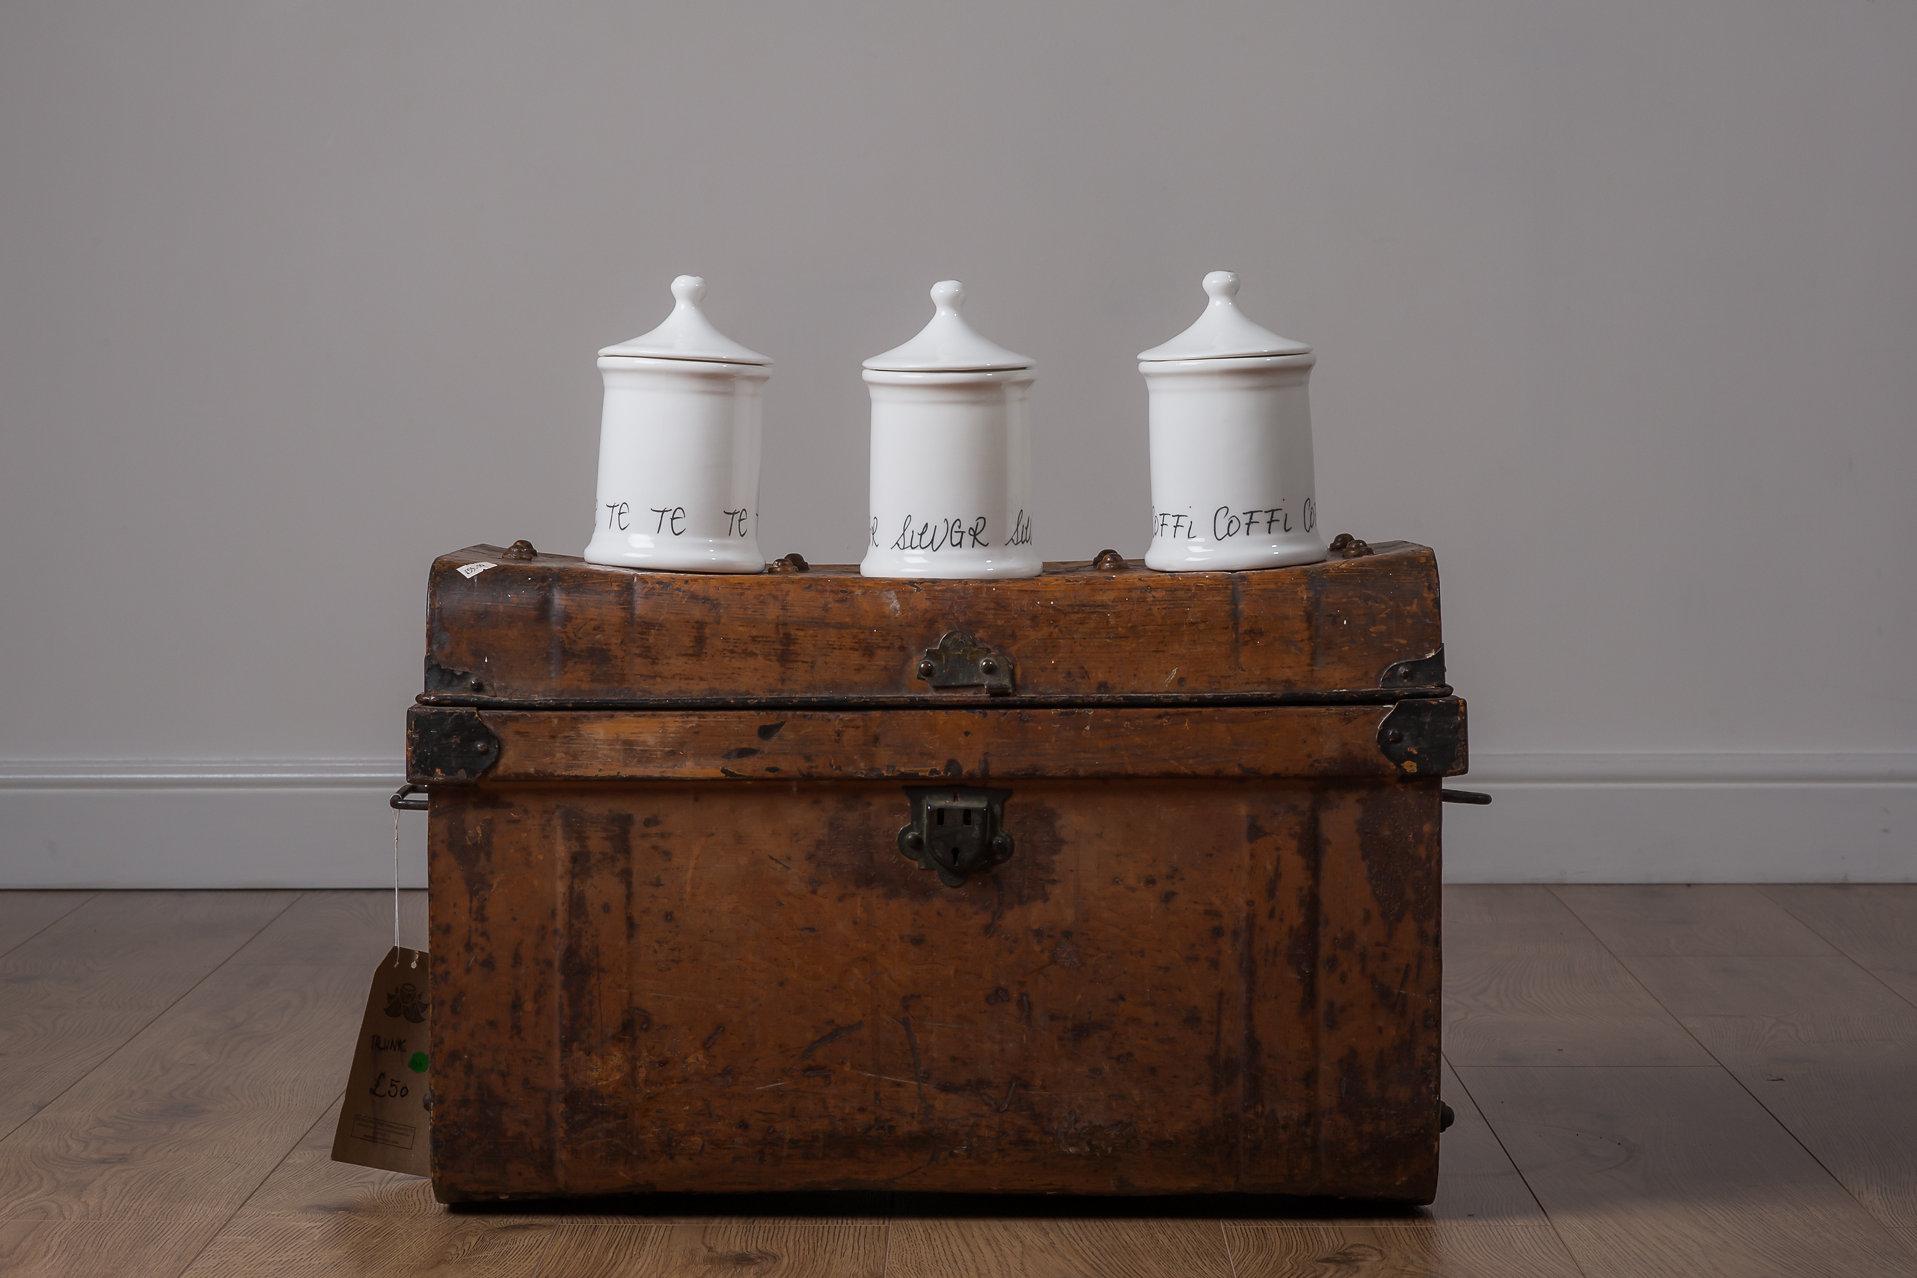 100 ceramic kitchen canister set orange ceramic kitchen